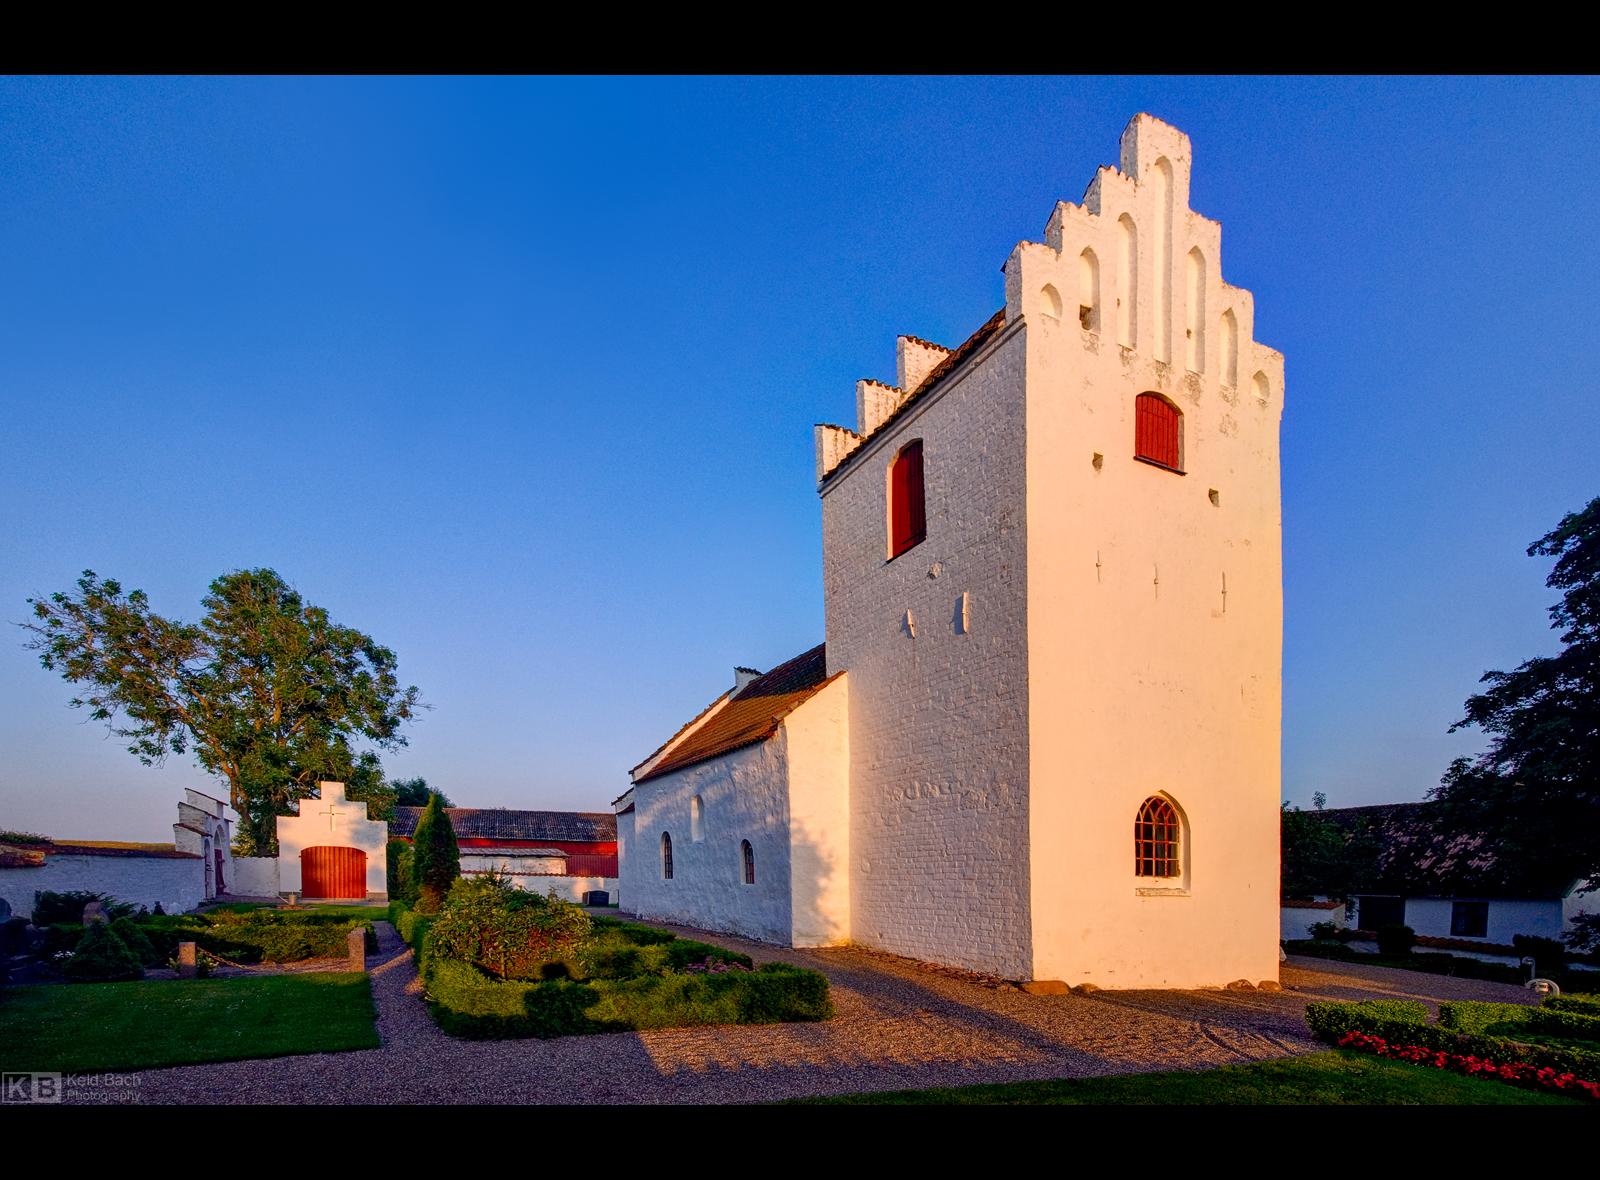 Gudum Church by KeldBach